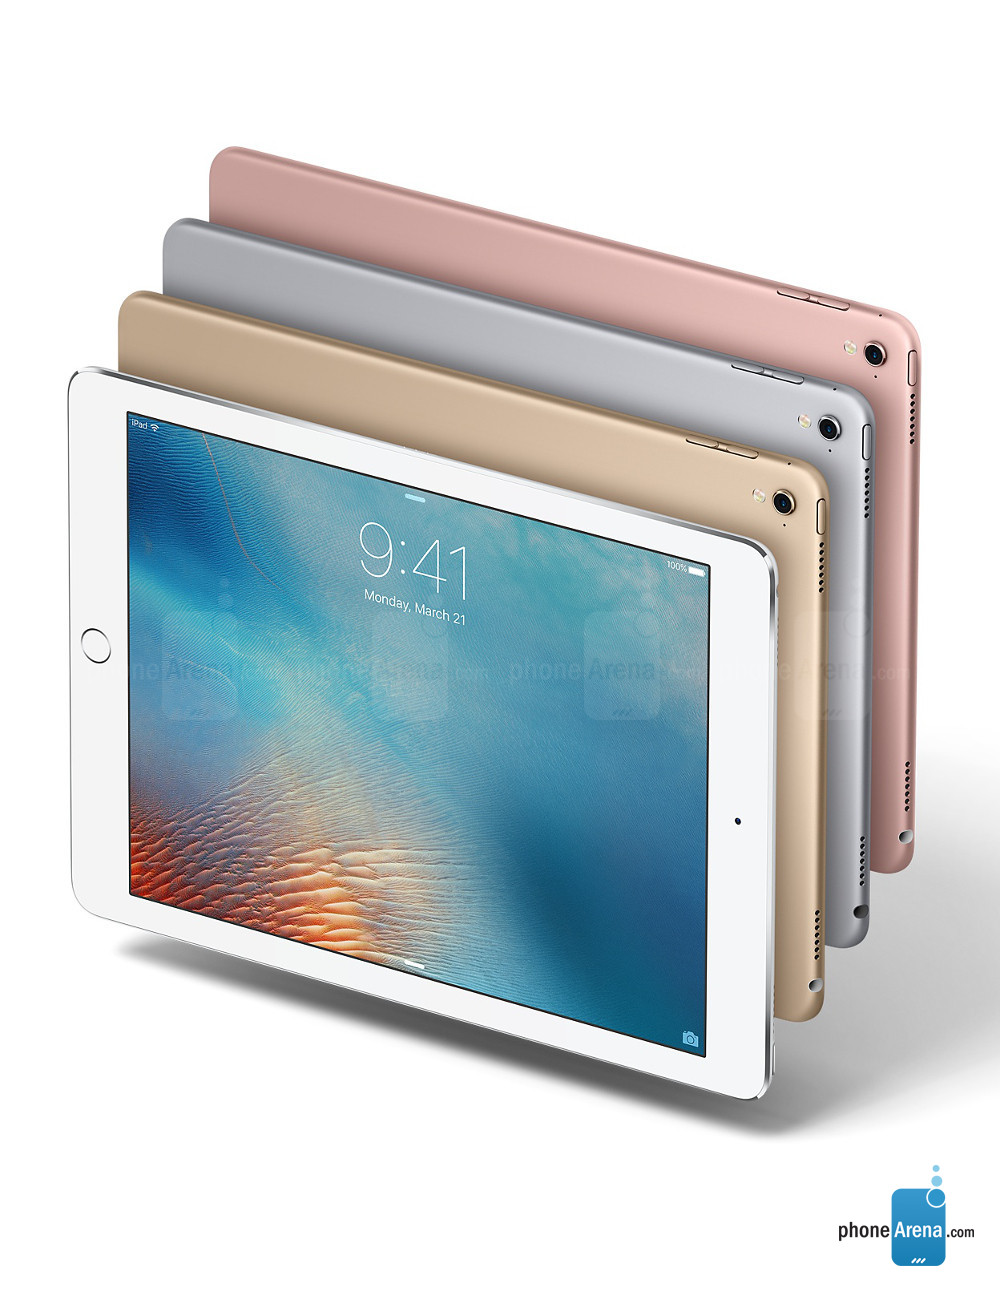 Apple iPad Pro 9.7 inch 2